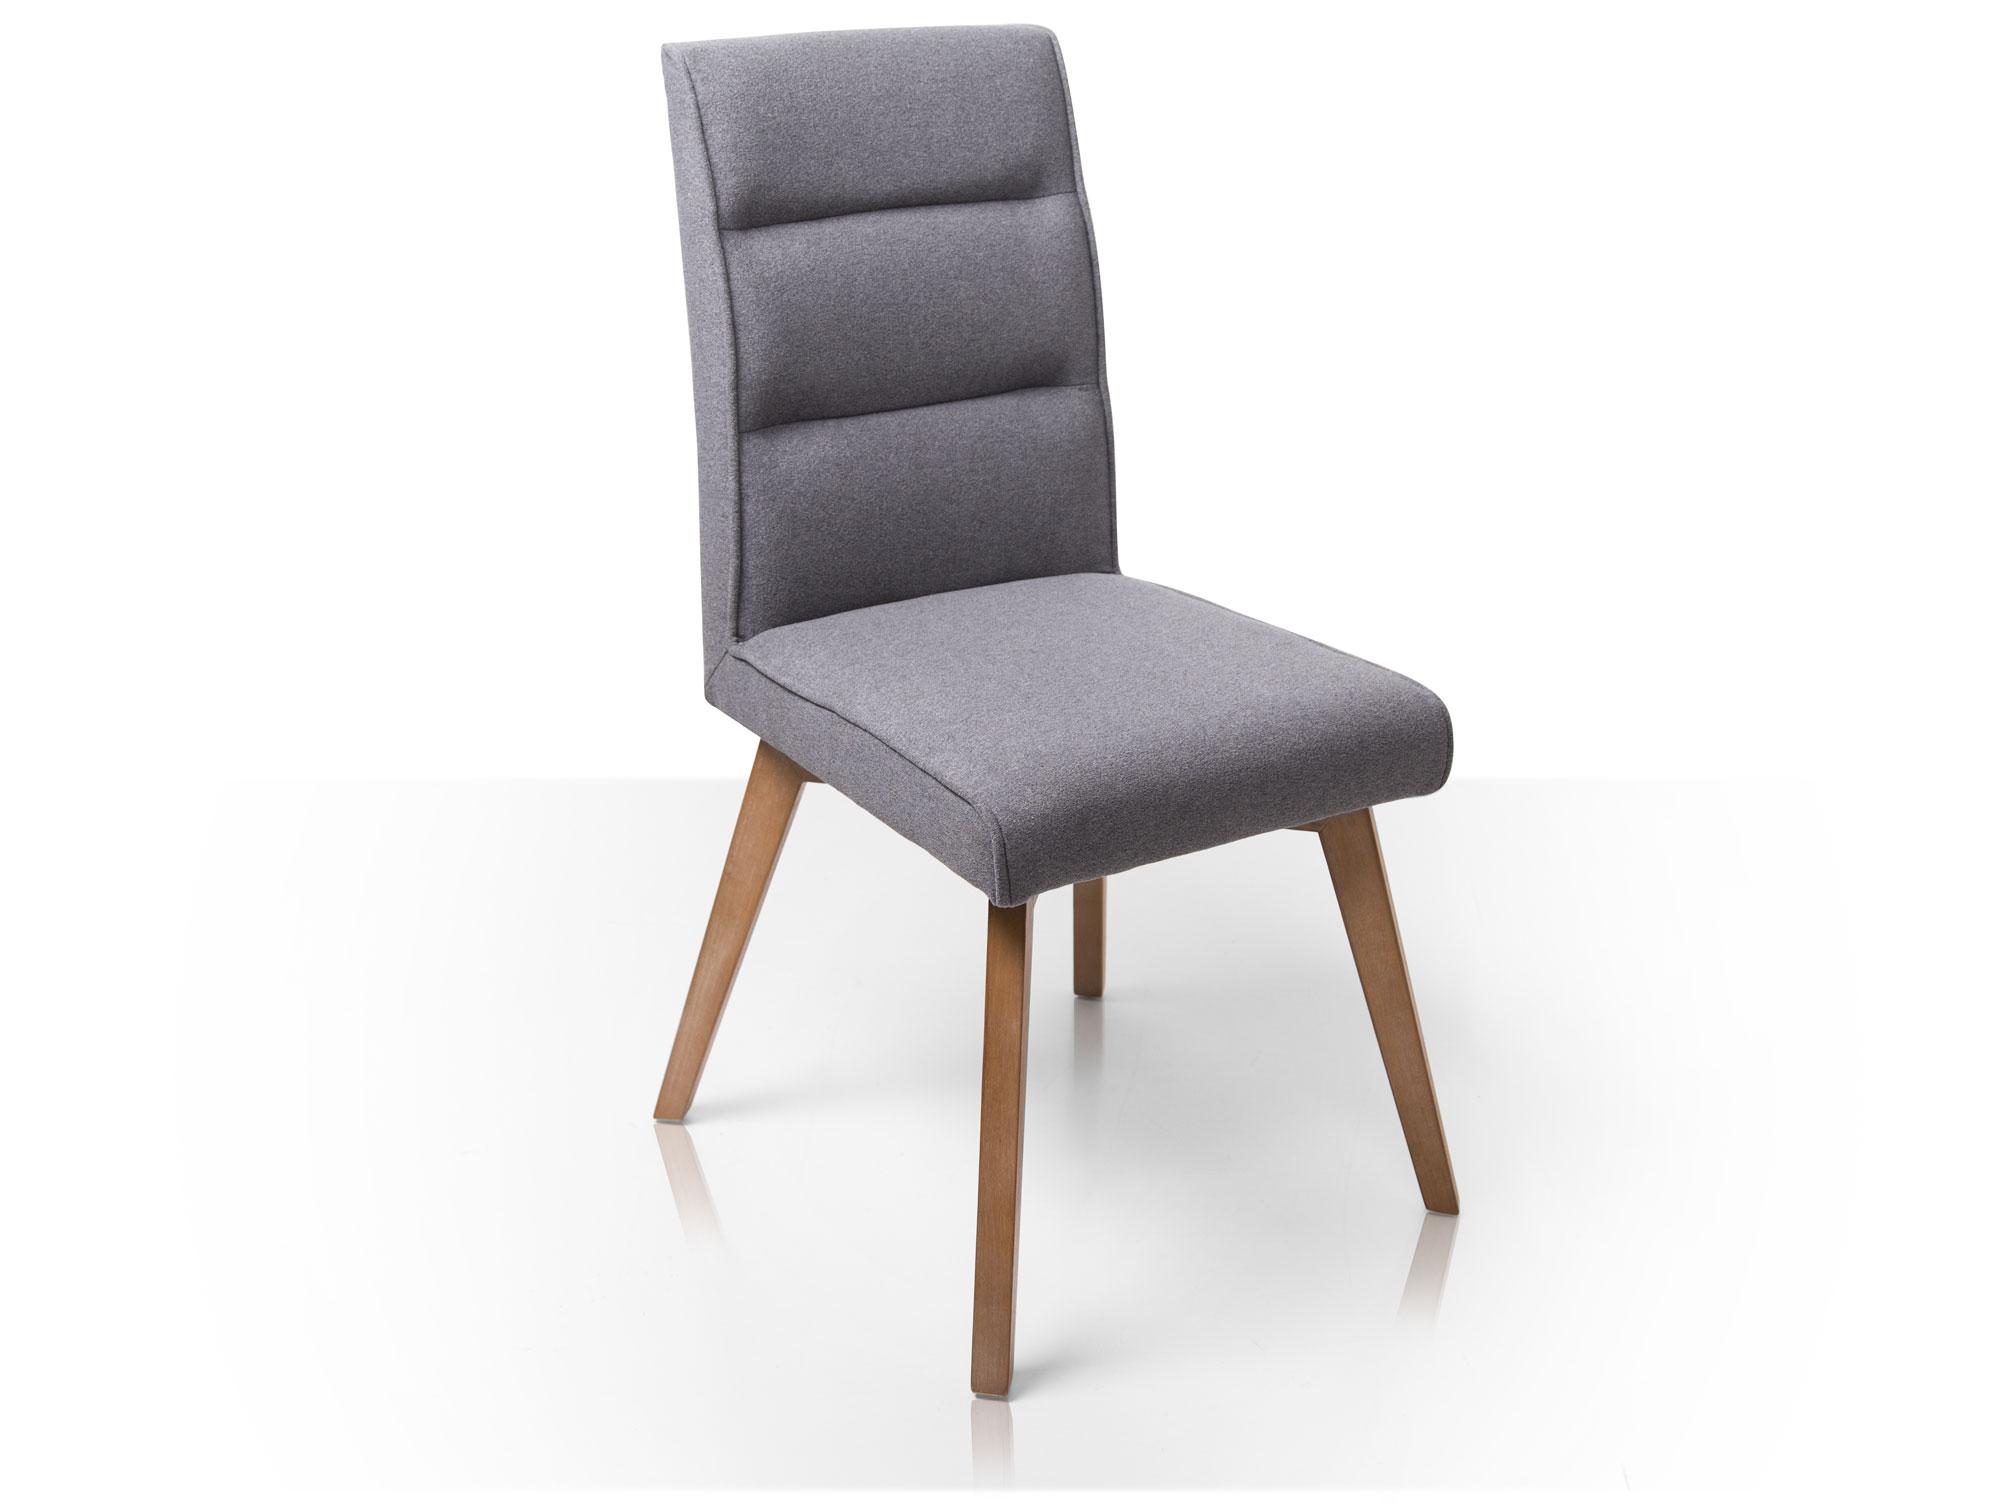 molly polsterstuhl eiche stoffbezug anthrazit. Black Bedroom Furniture Sets. Home Design Ideas